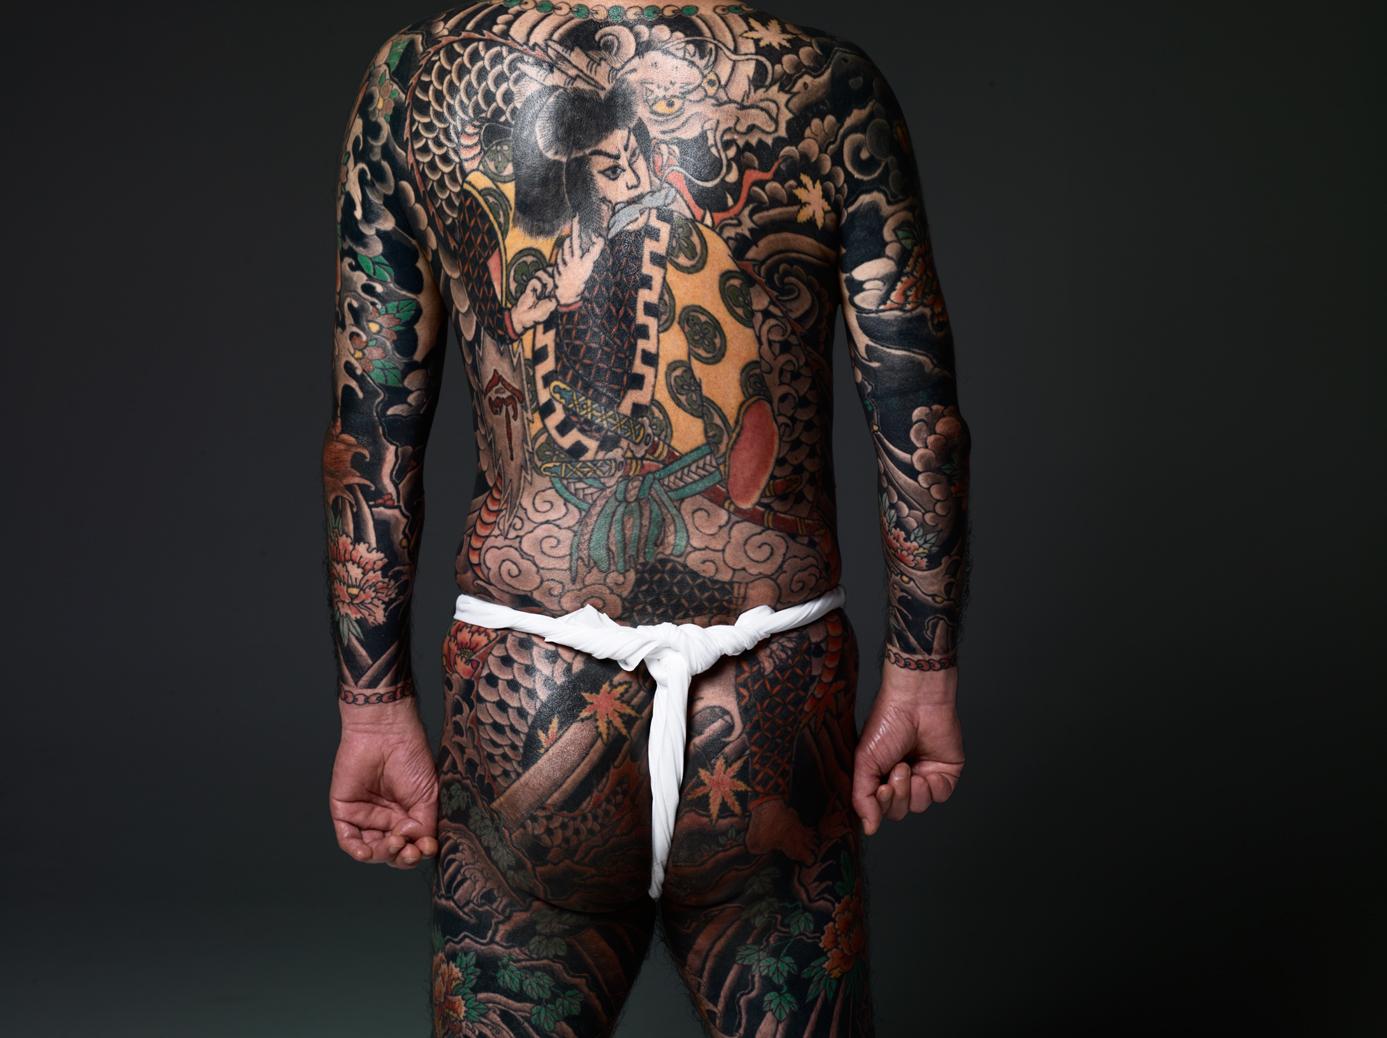 Yakuzas_SatoshiSaikusa16.jpg